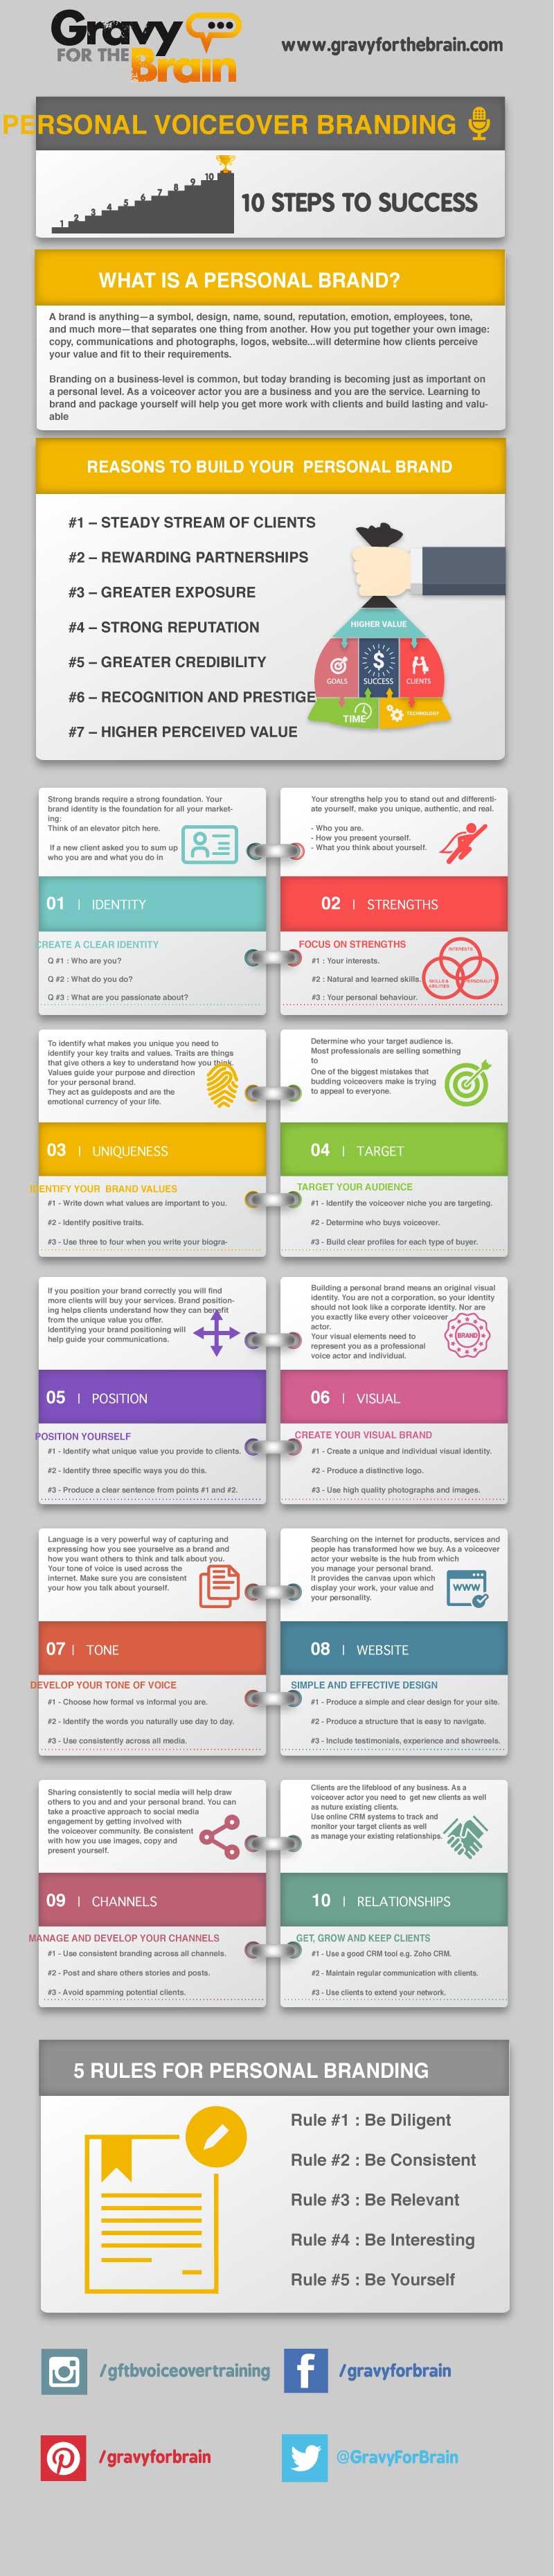 voice over branding infographic